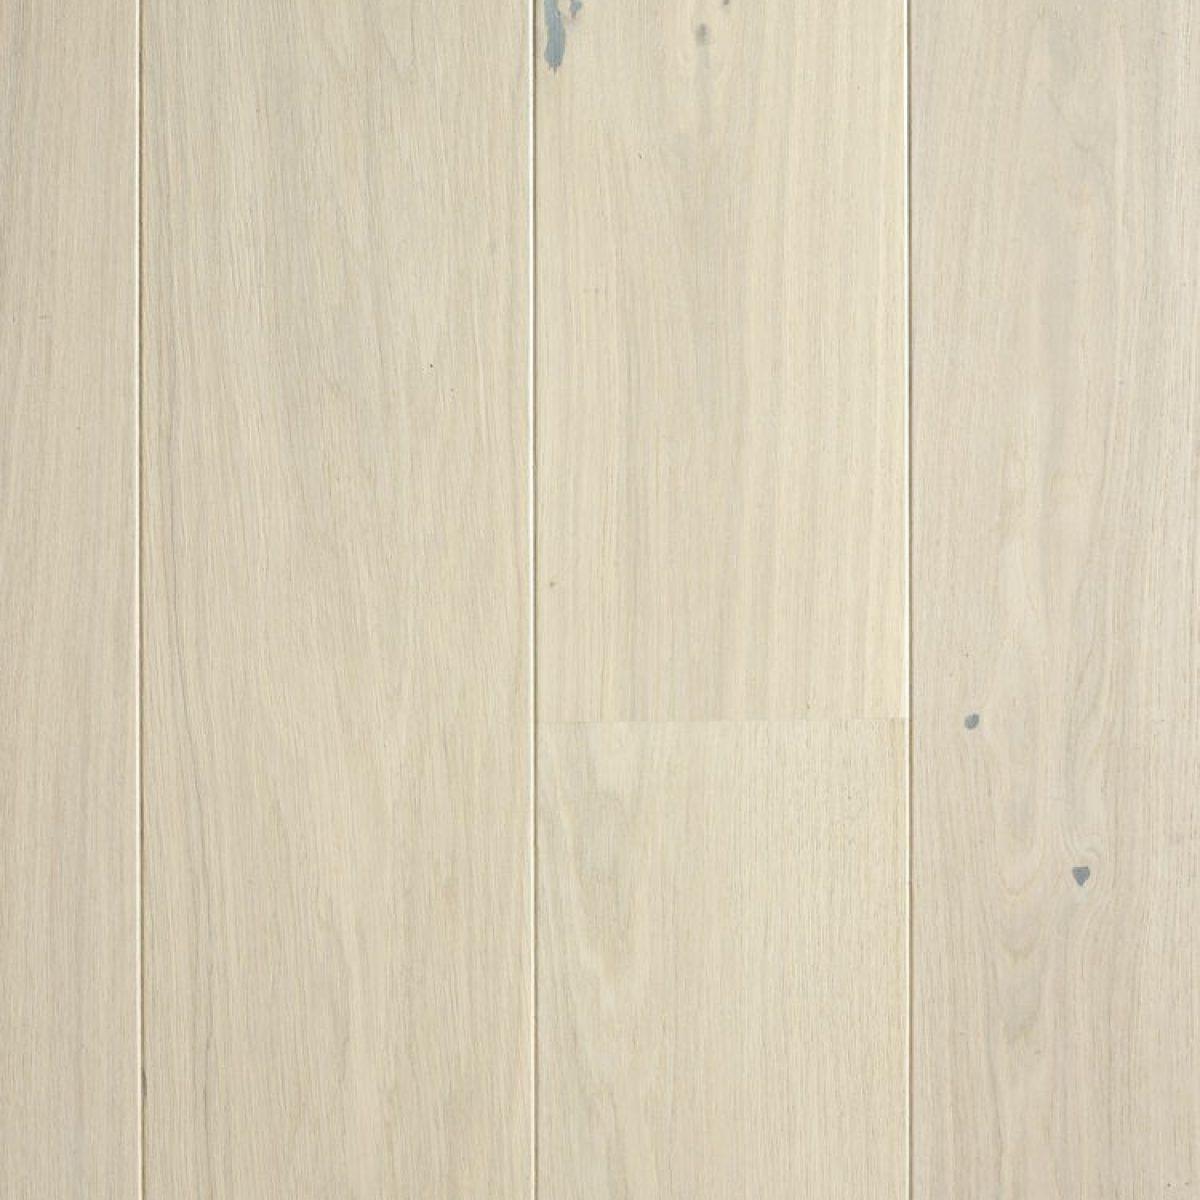 161671-saga-natural-gentle-white-oak